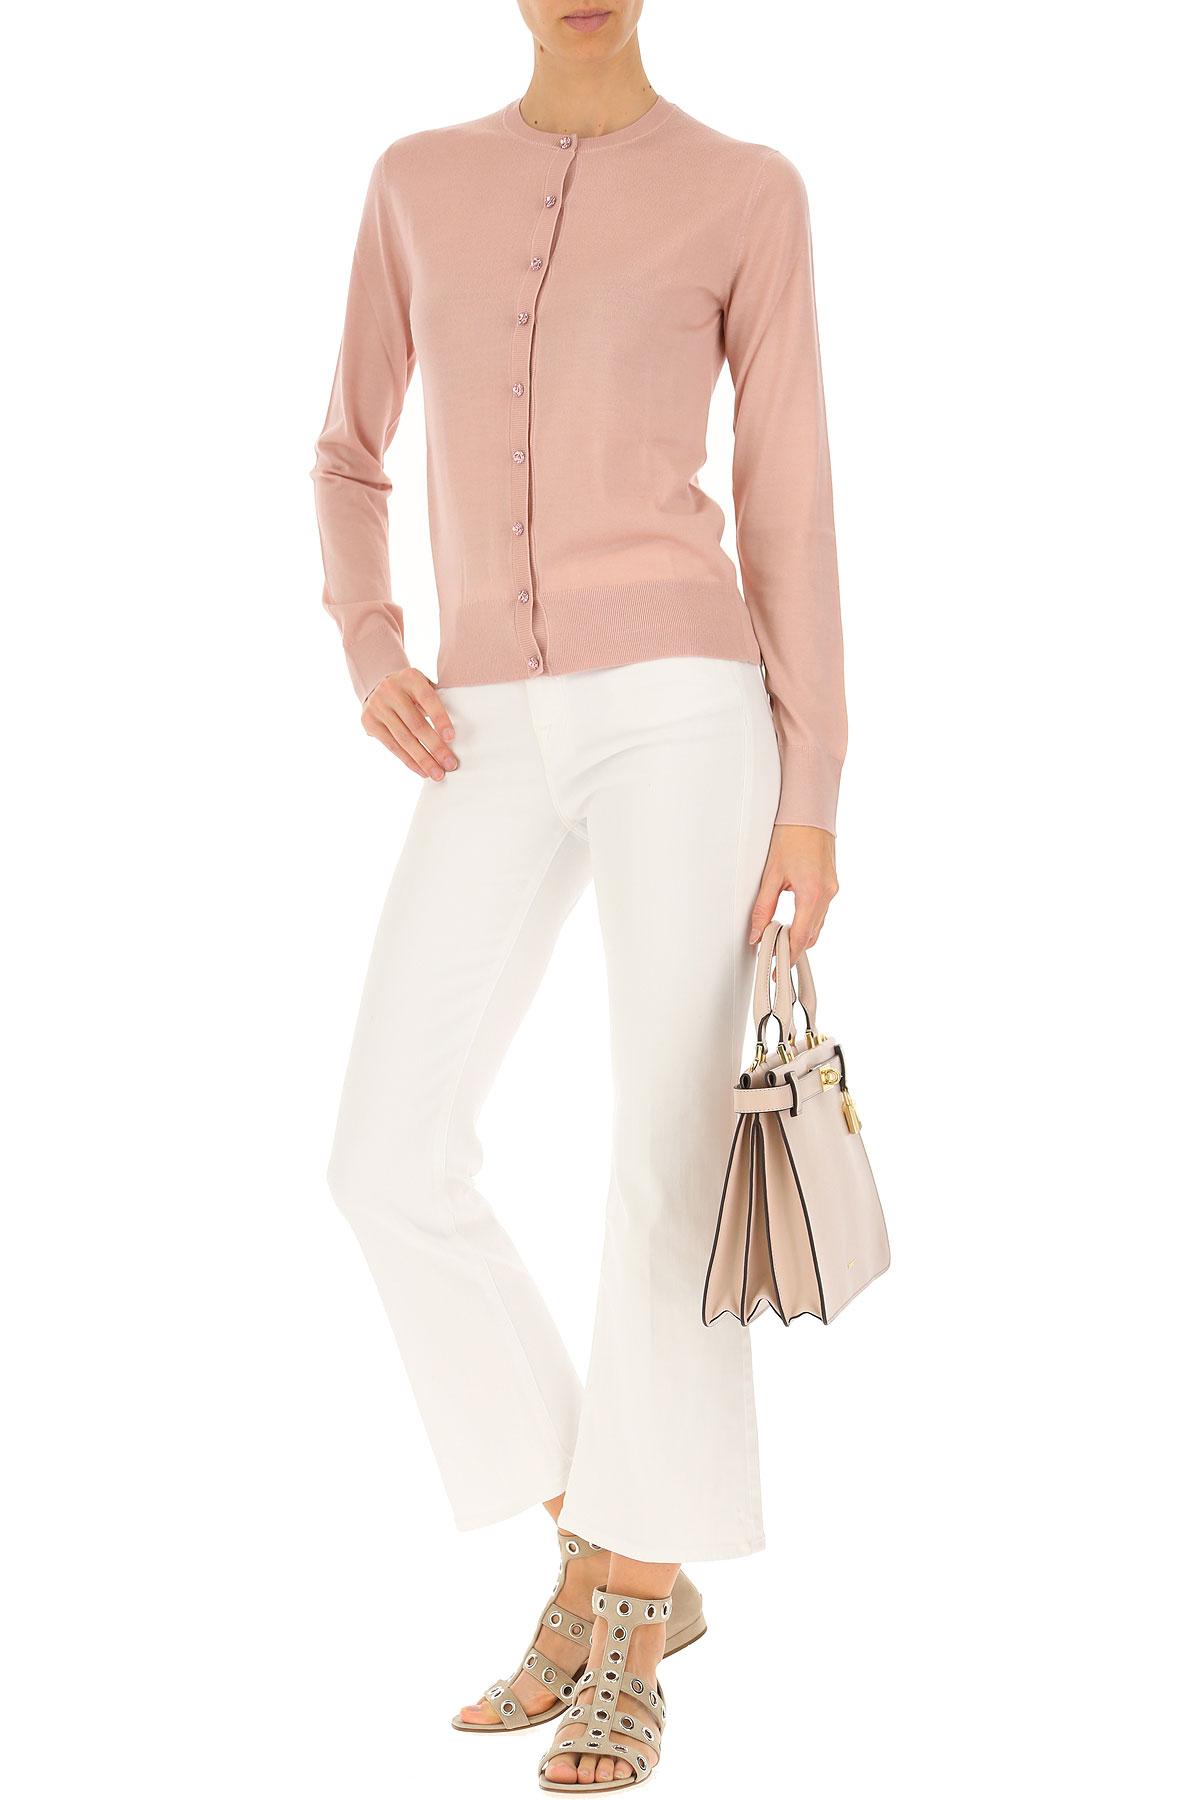 Rosa Dolce Mujer amp; Ropa verano Para nbsp; Primavera Gabbana Antiguo 2019 BS4T8B